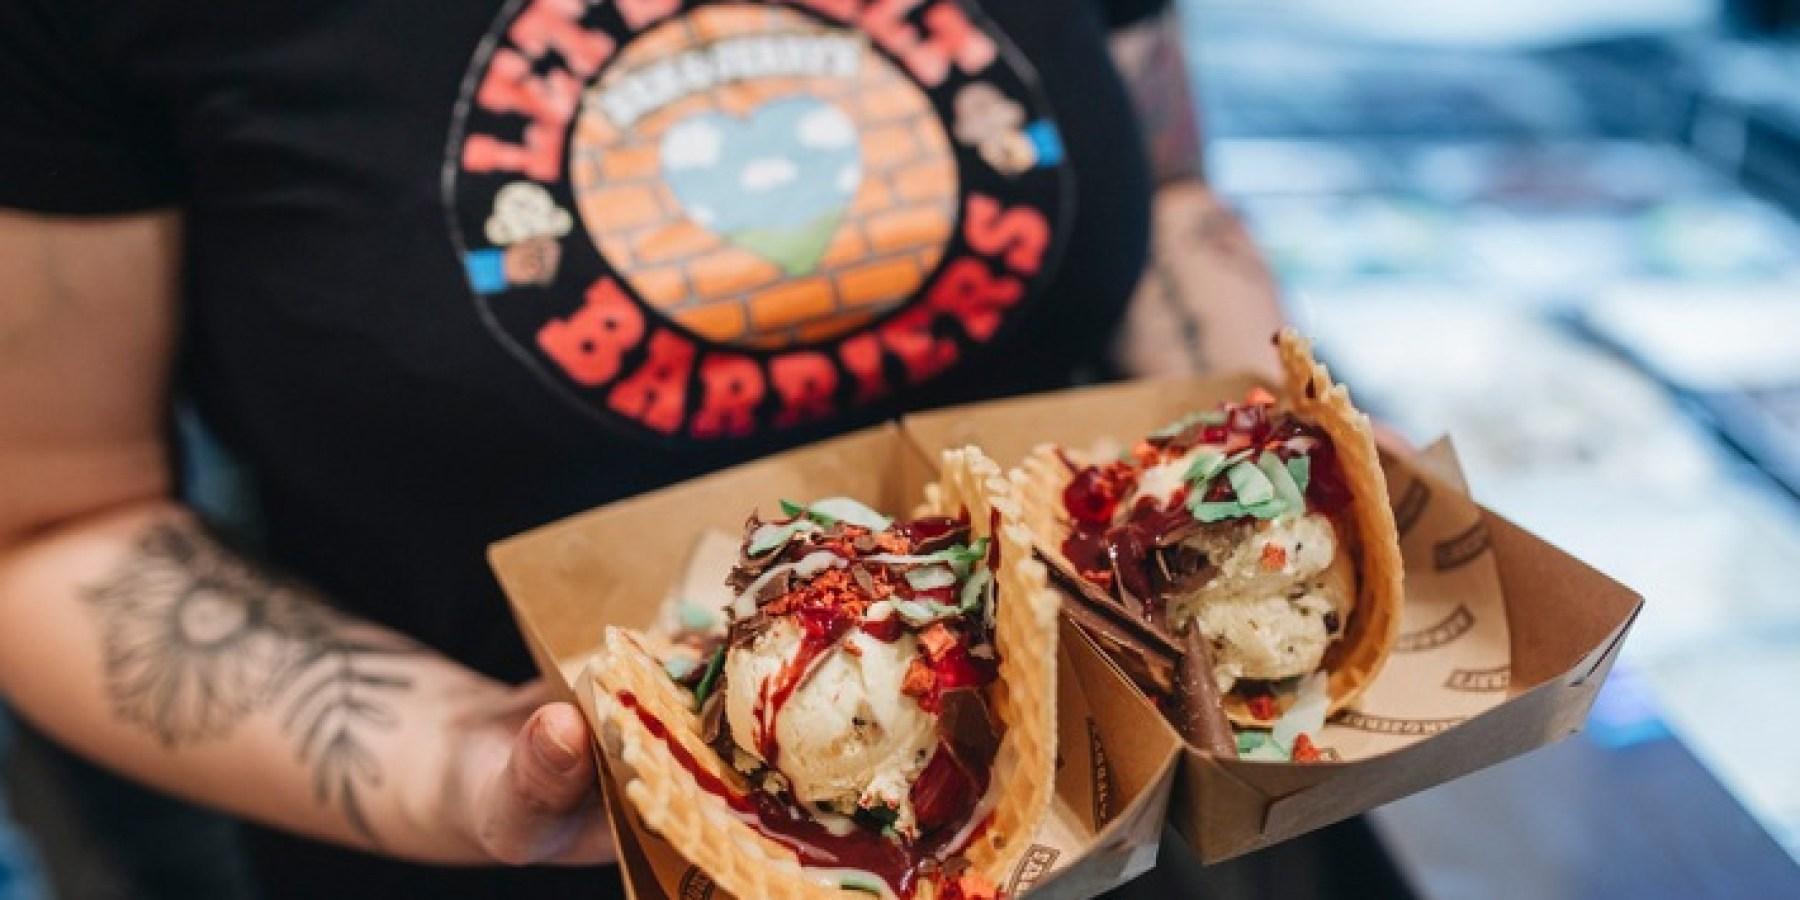 Ben & Jerry's eröffnet mit dem Schöner Döner erstes Café in Berlin